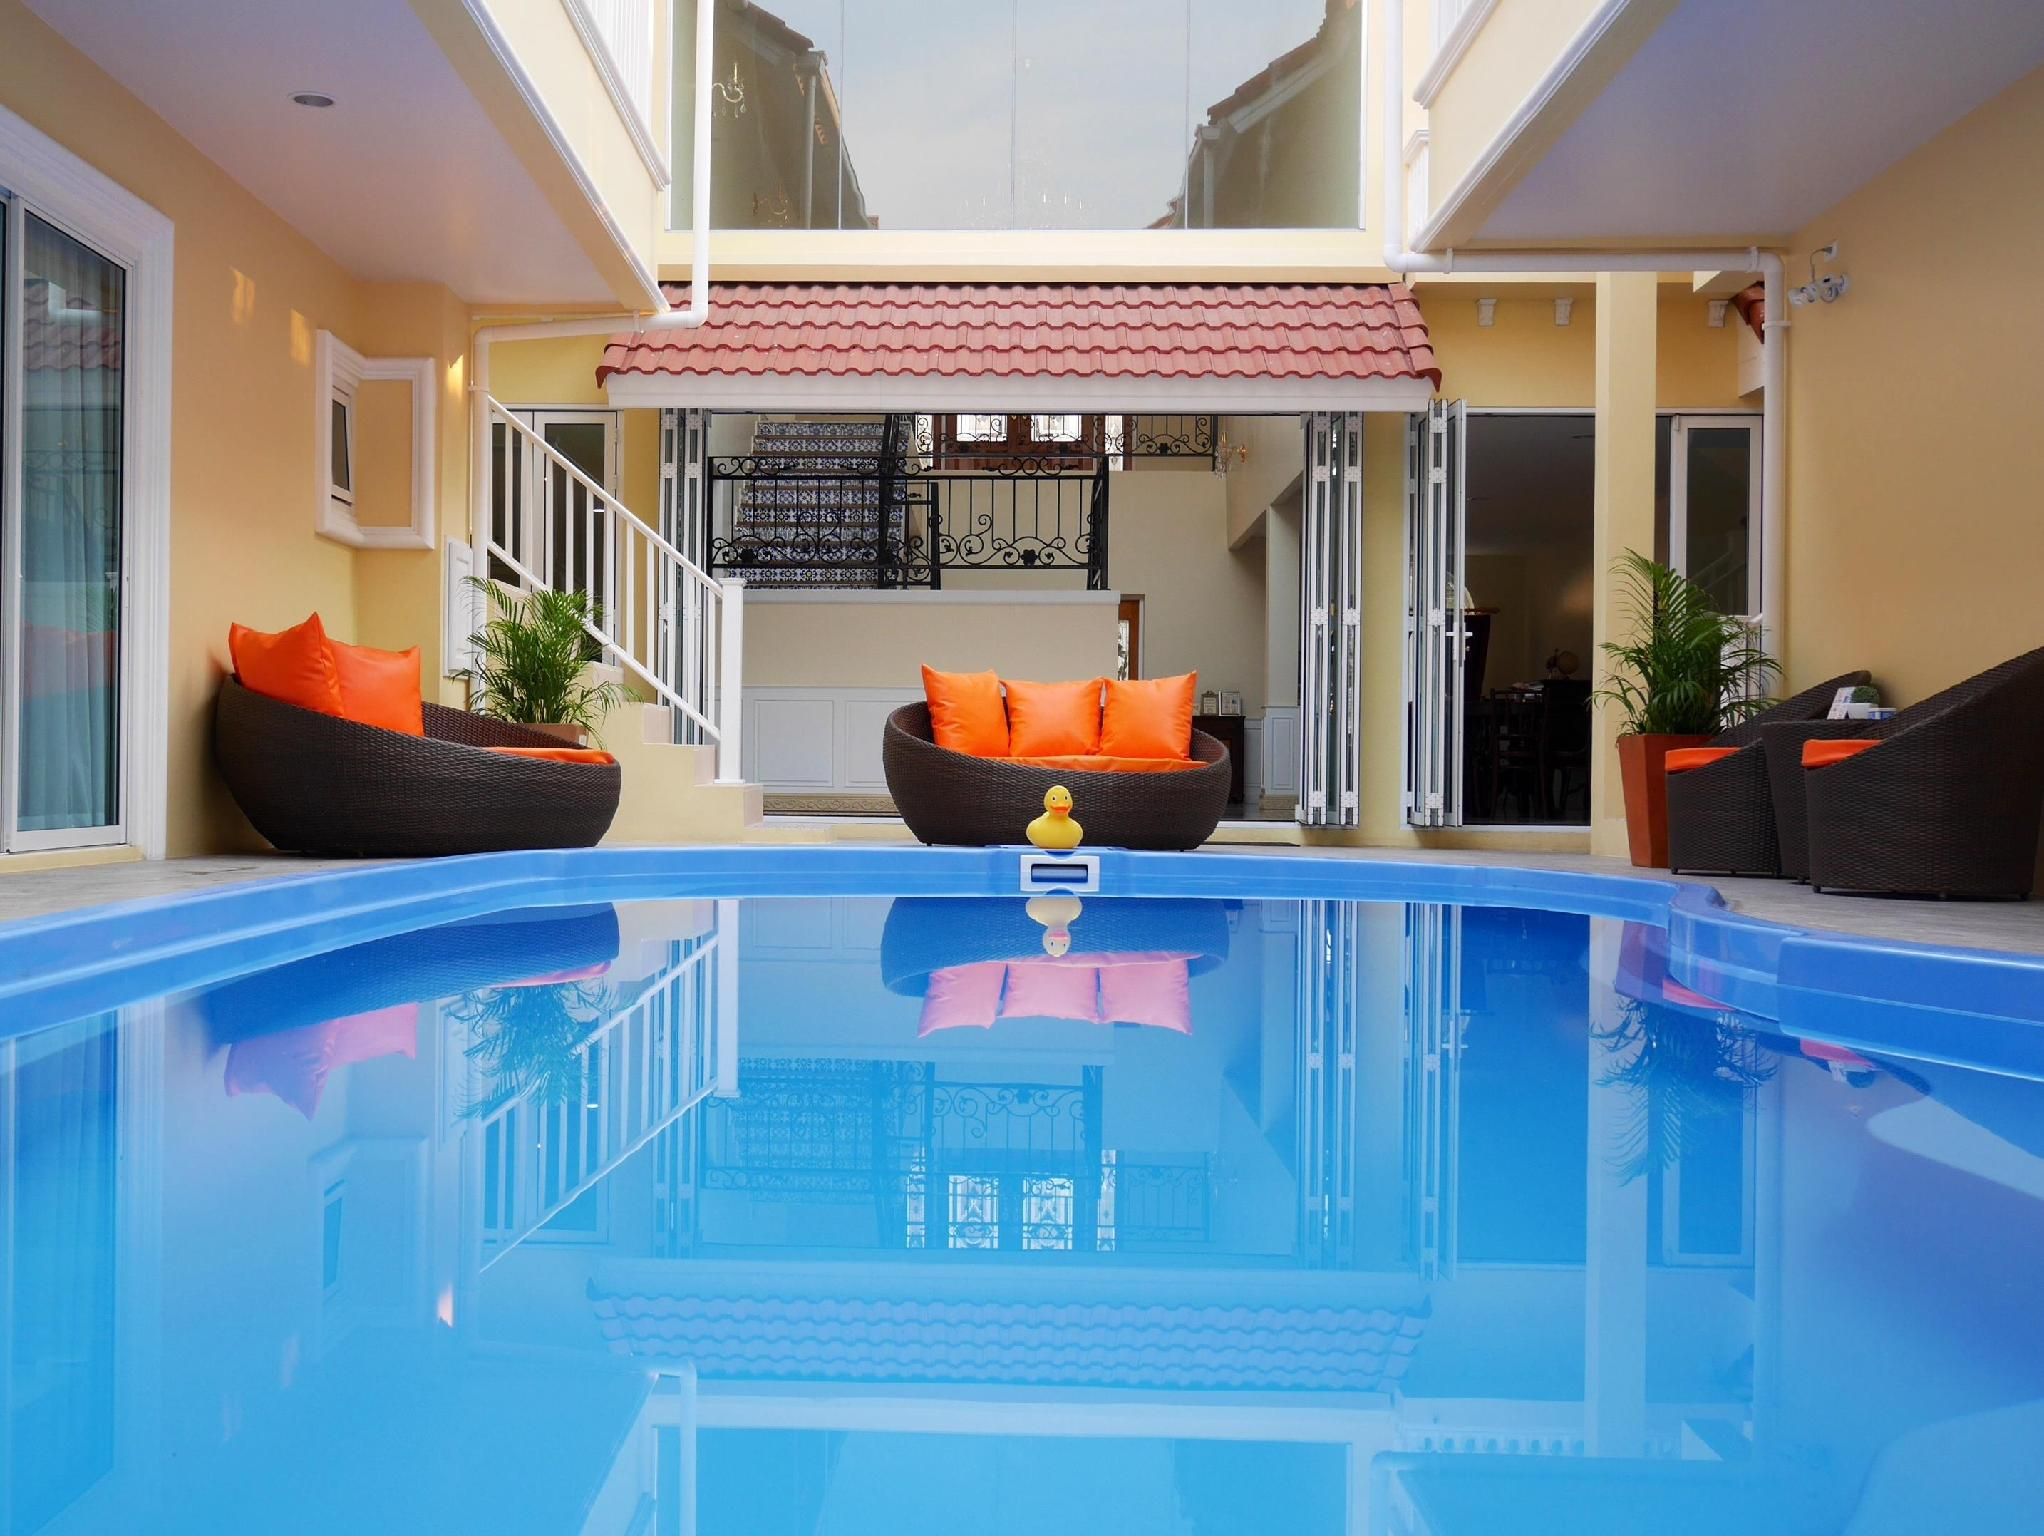 Villa de Chiang Mai วิลลา เดอ เชียงใหม่